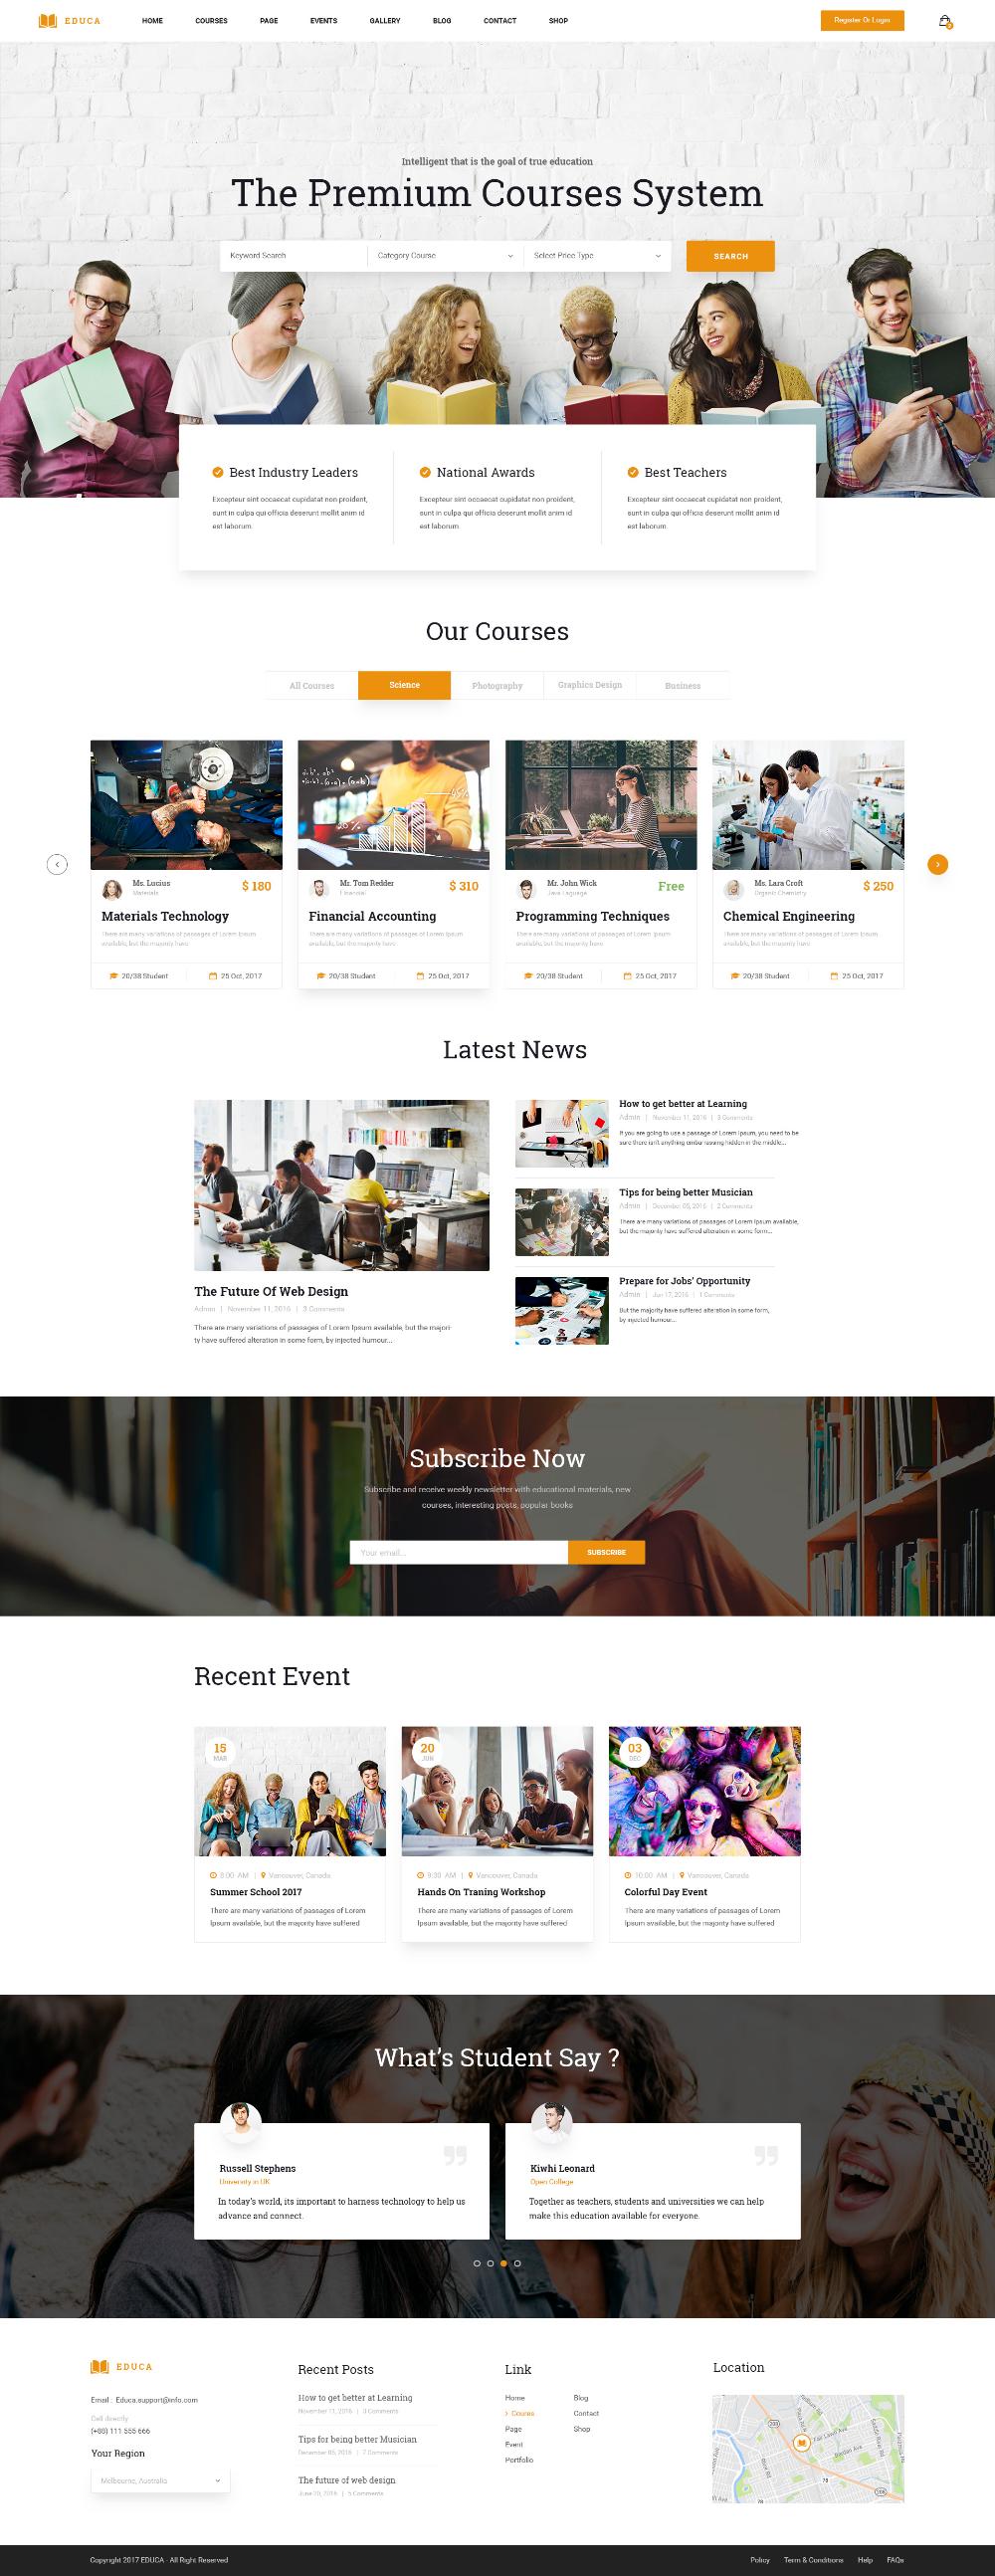 Educa With Images Learning Website Design Web Design Websites Web Design Quotes